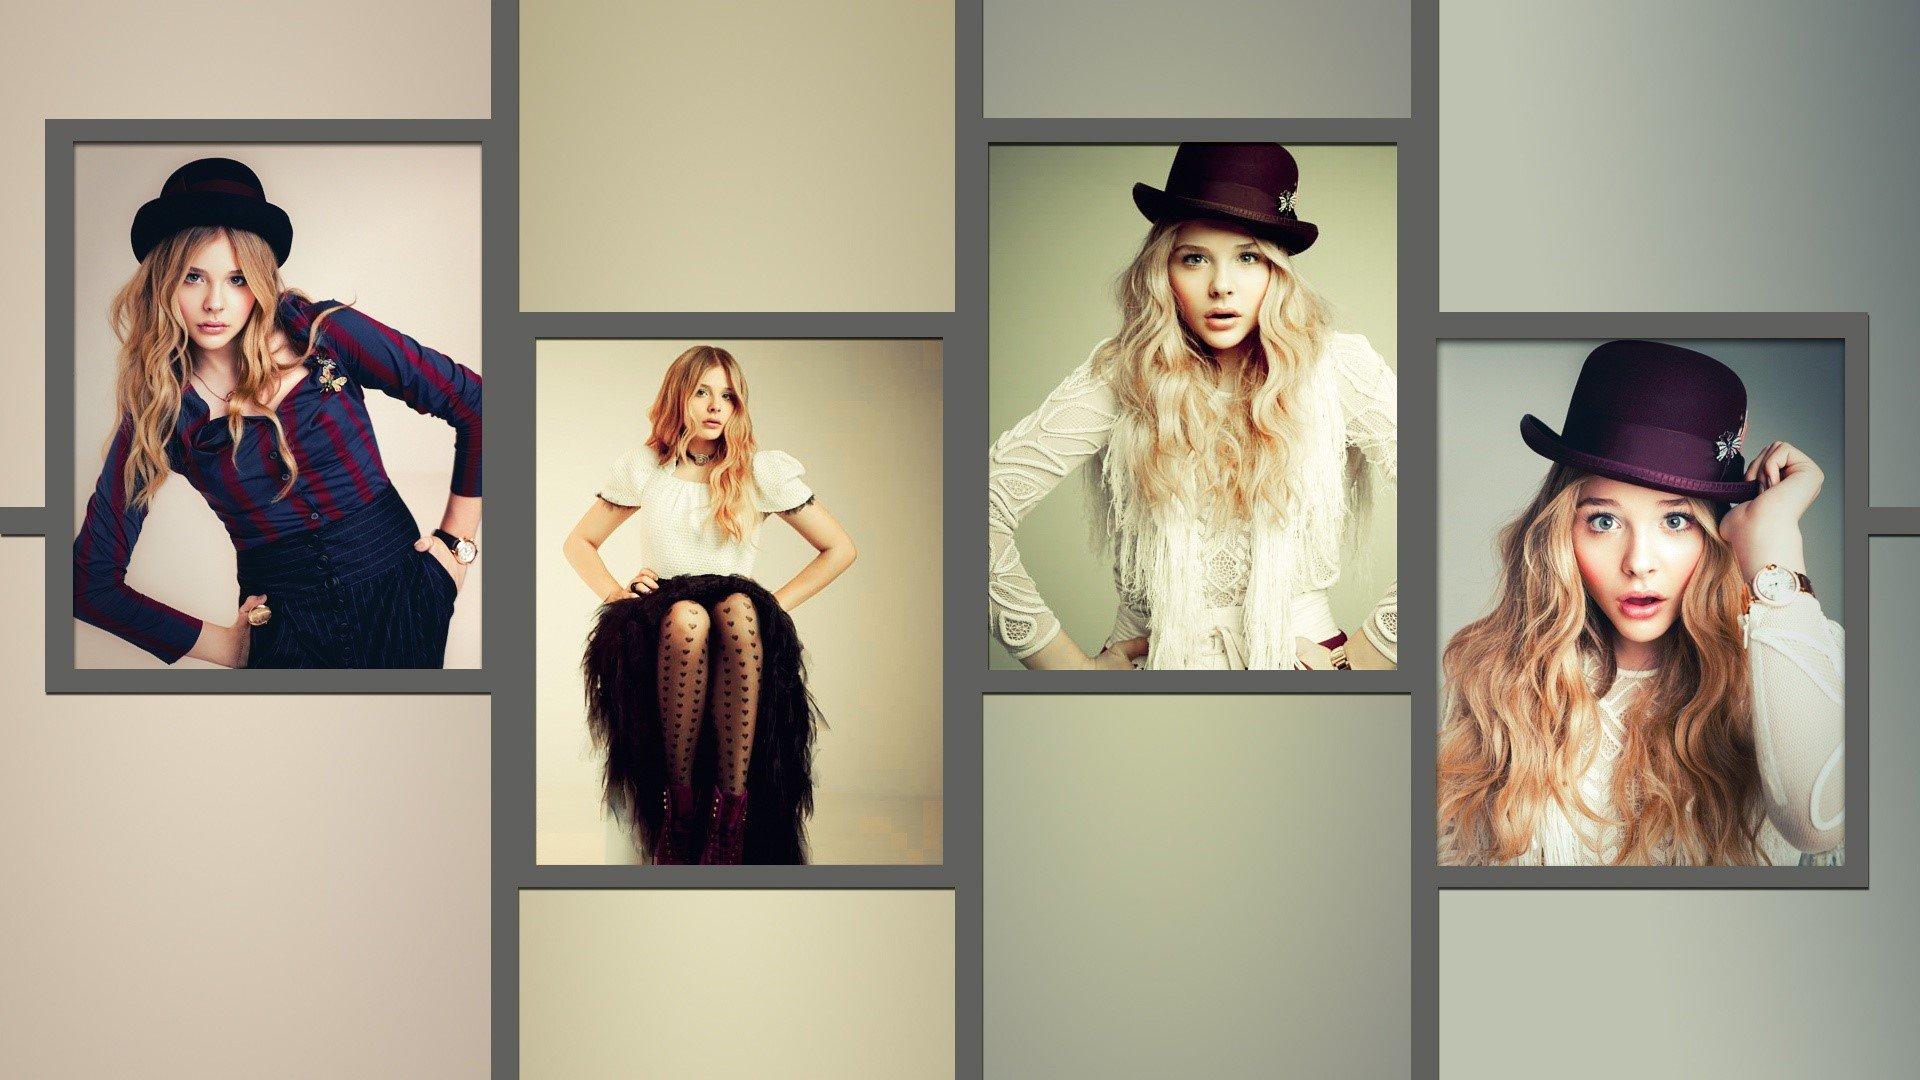 Wallpaper Chloe Moretz Collage Images